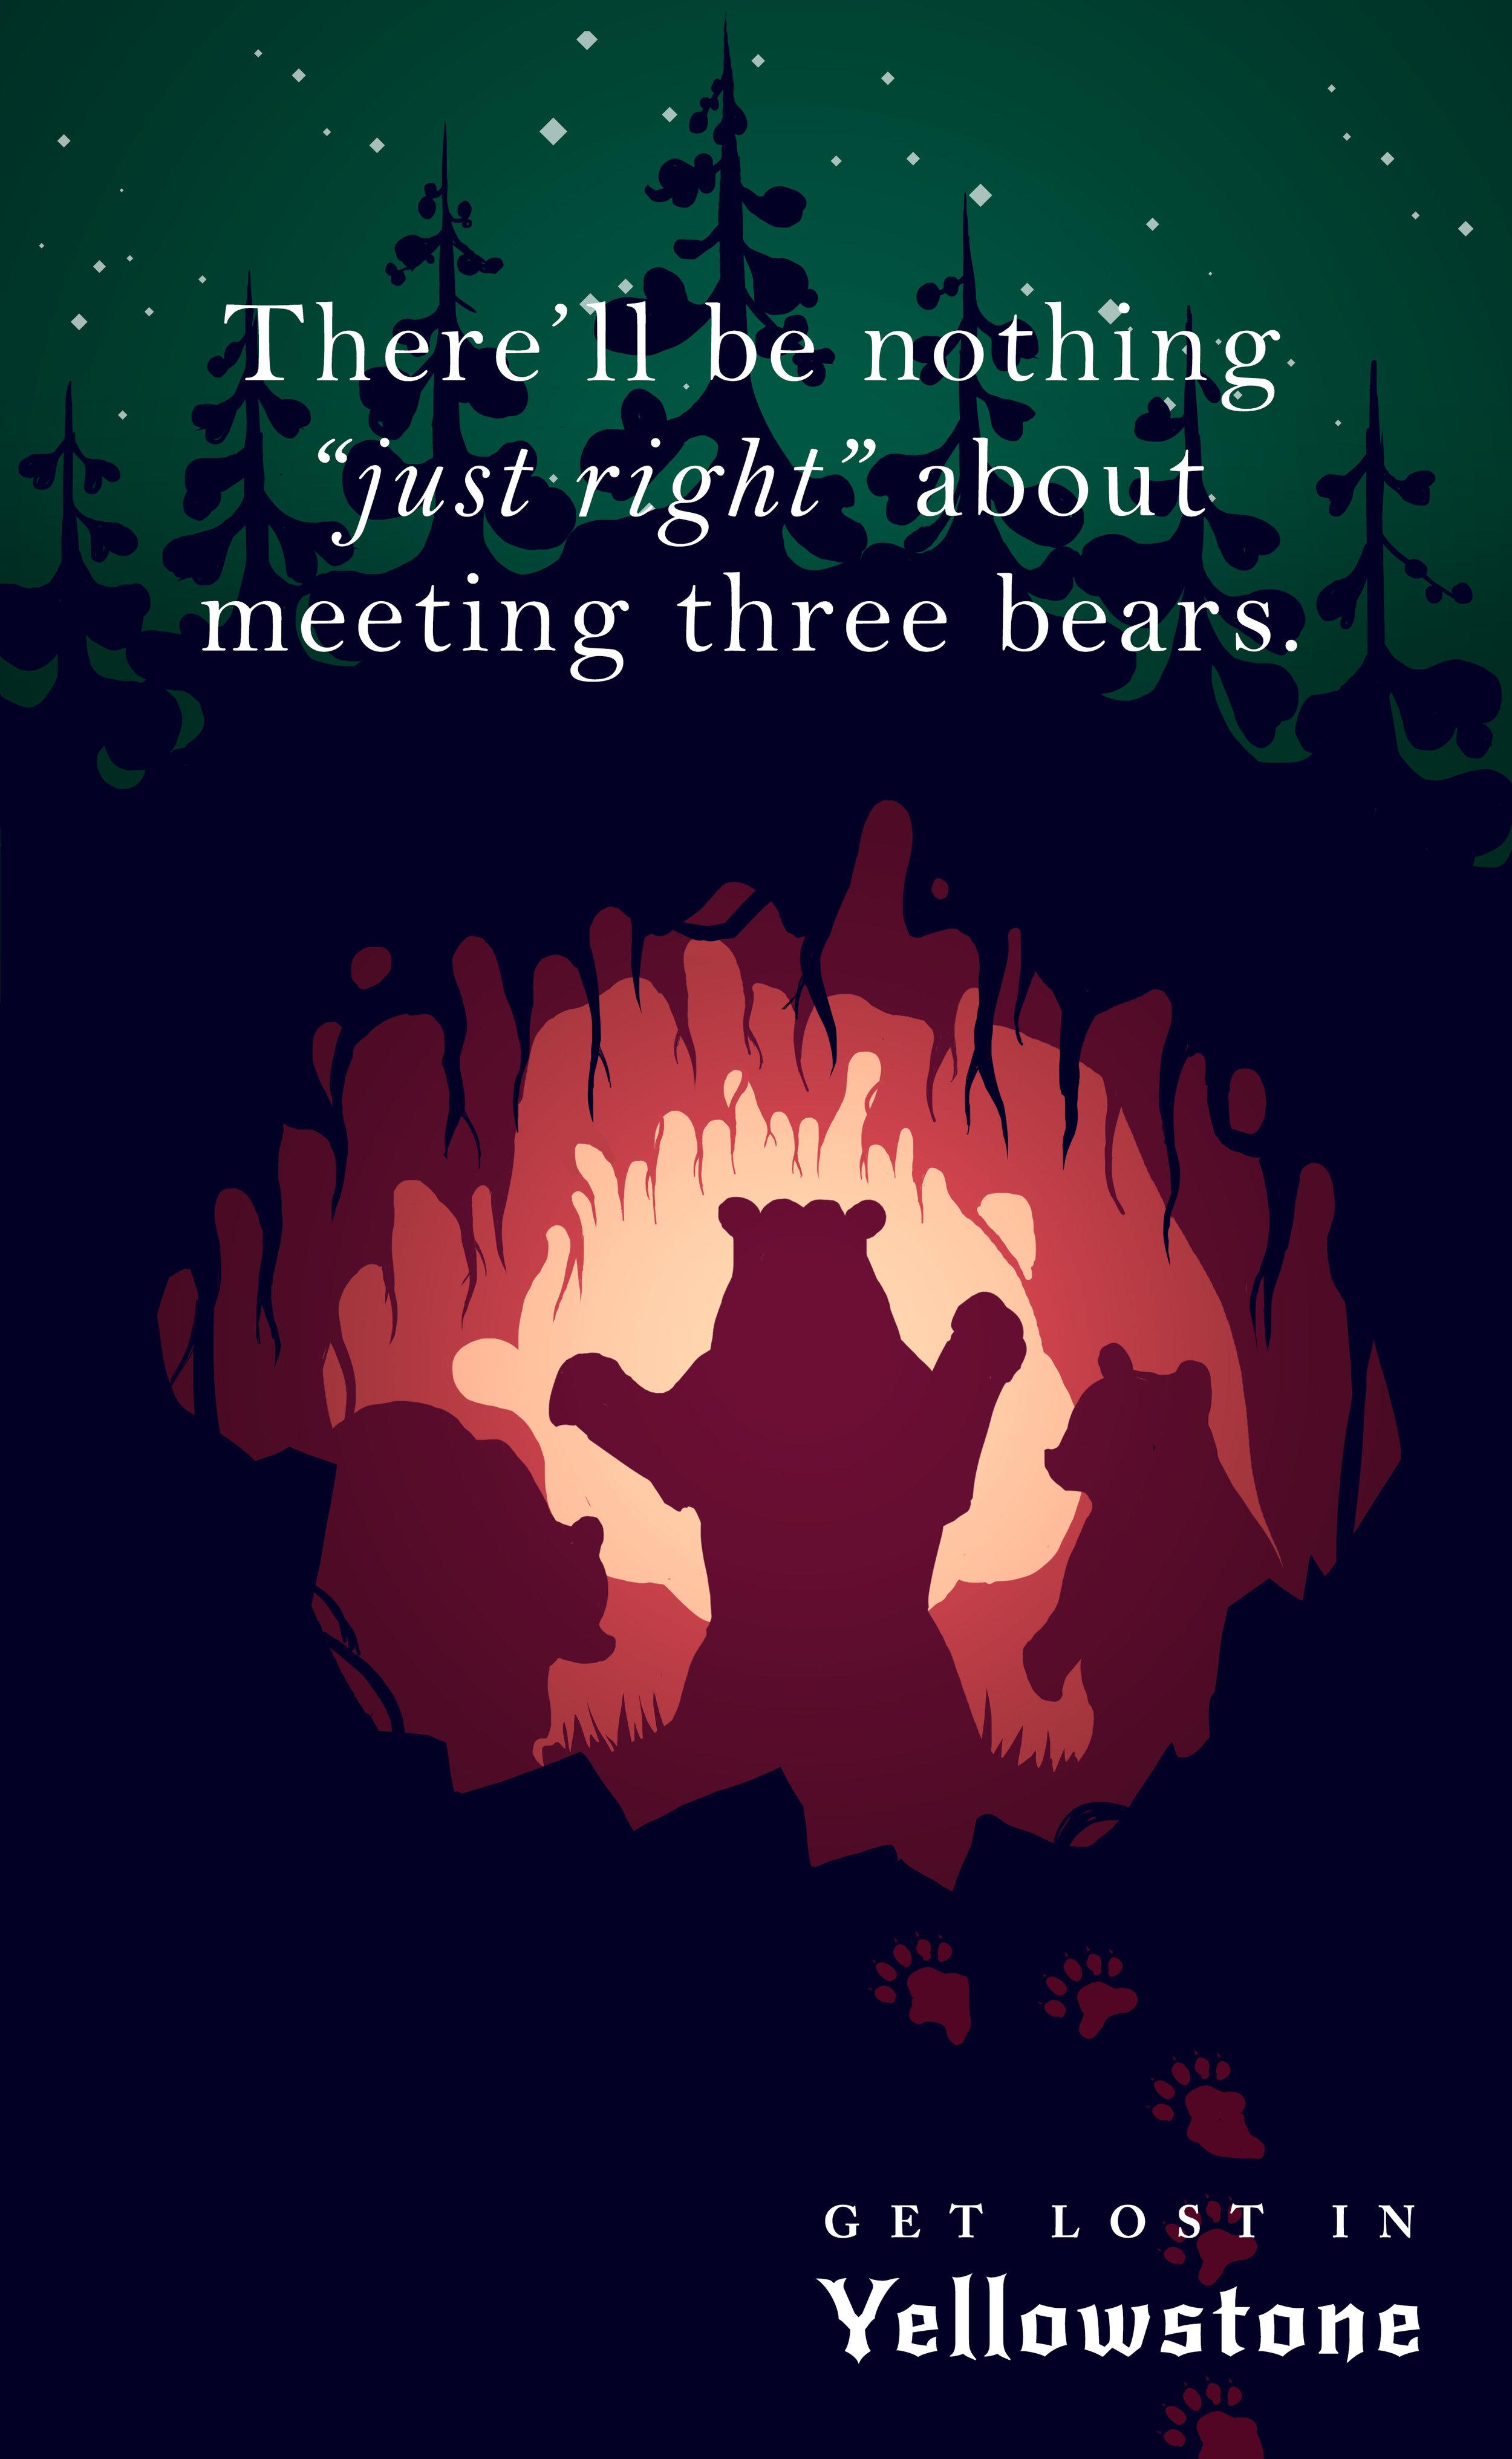 yellowstone bears.jpg